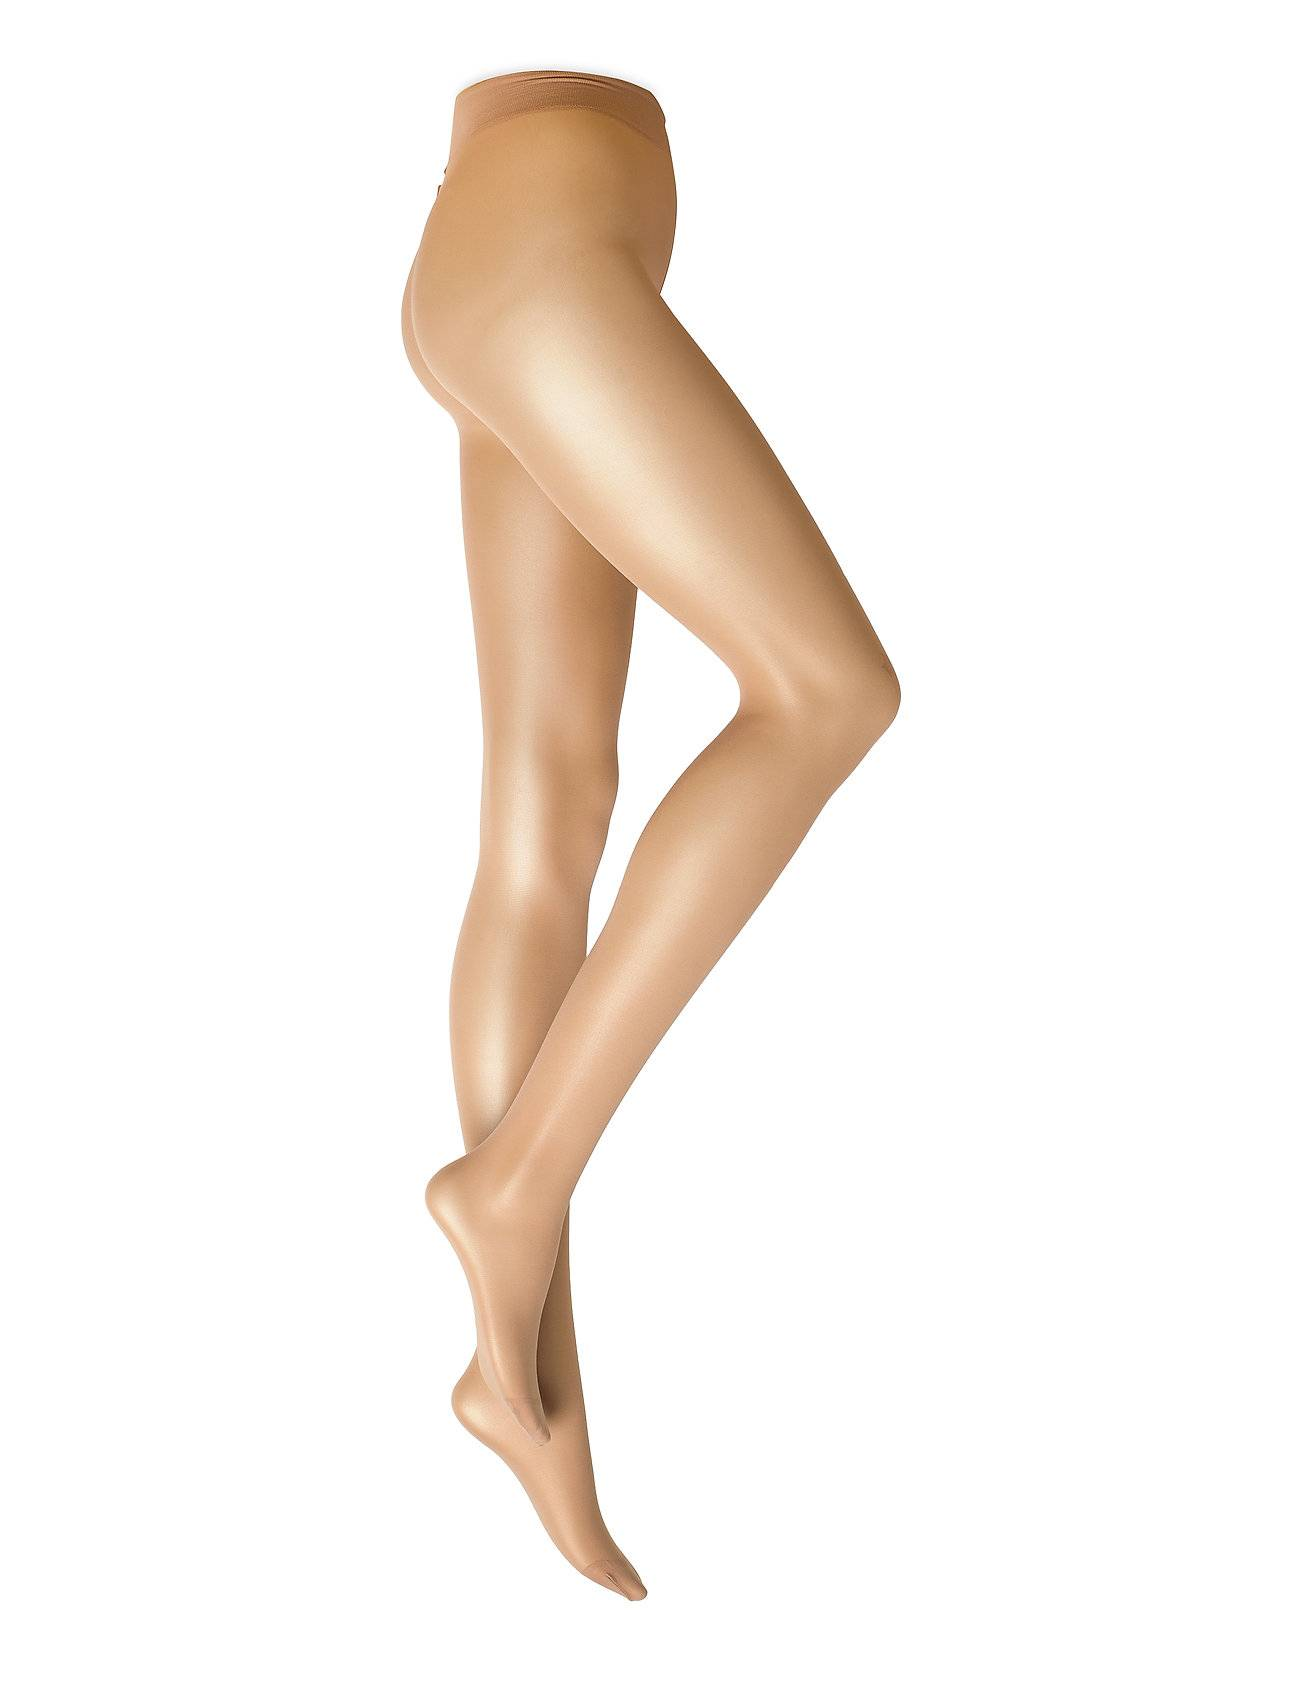 Swedish Stockings Maria Innovation Tights Black Running/training Tights Beige Swedish Stockings